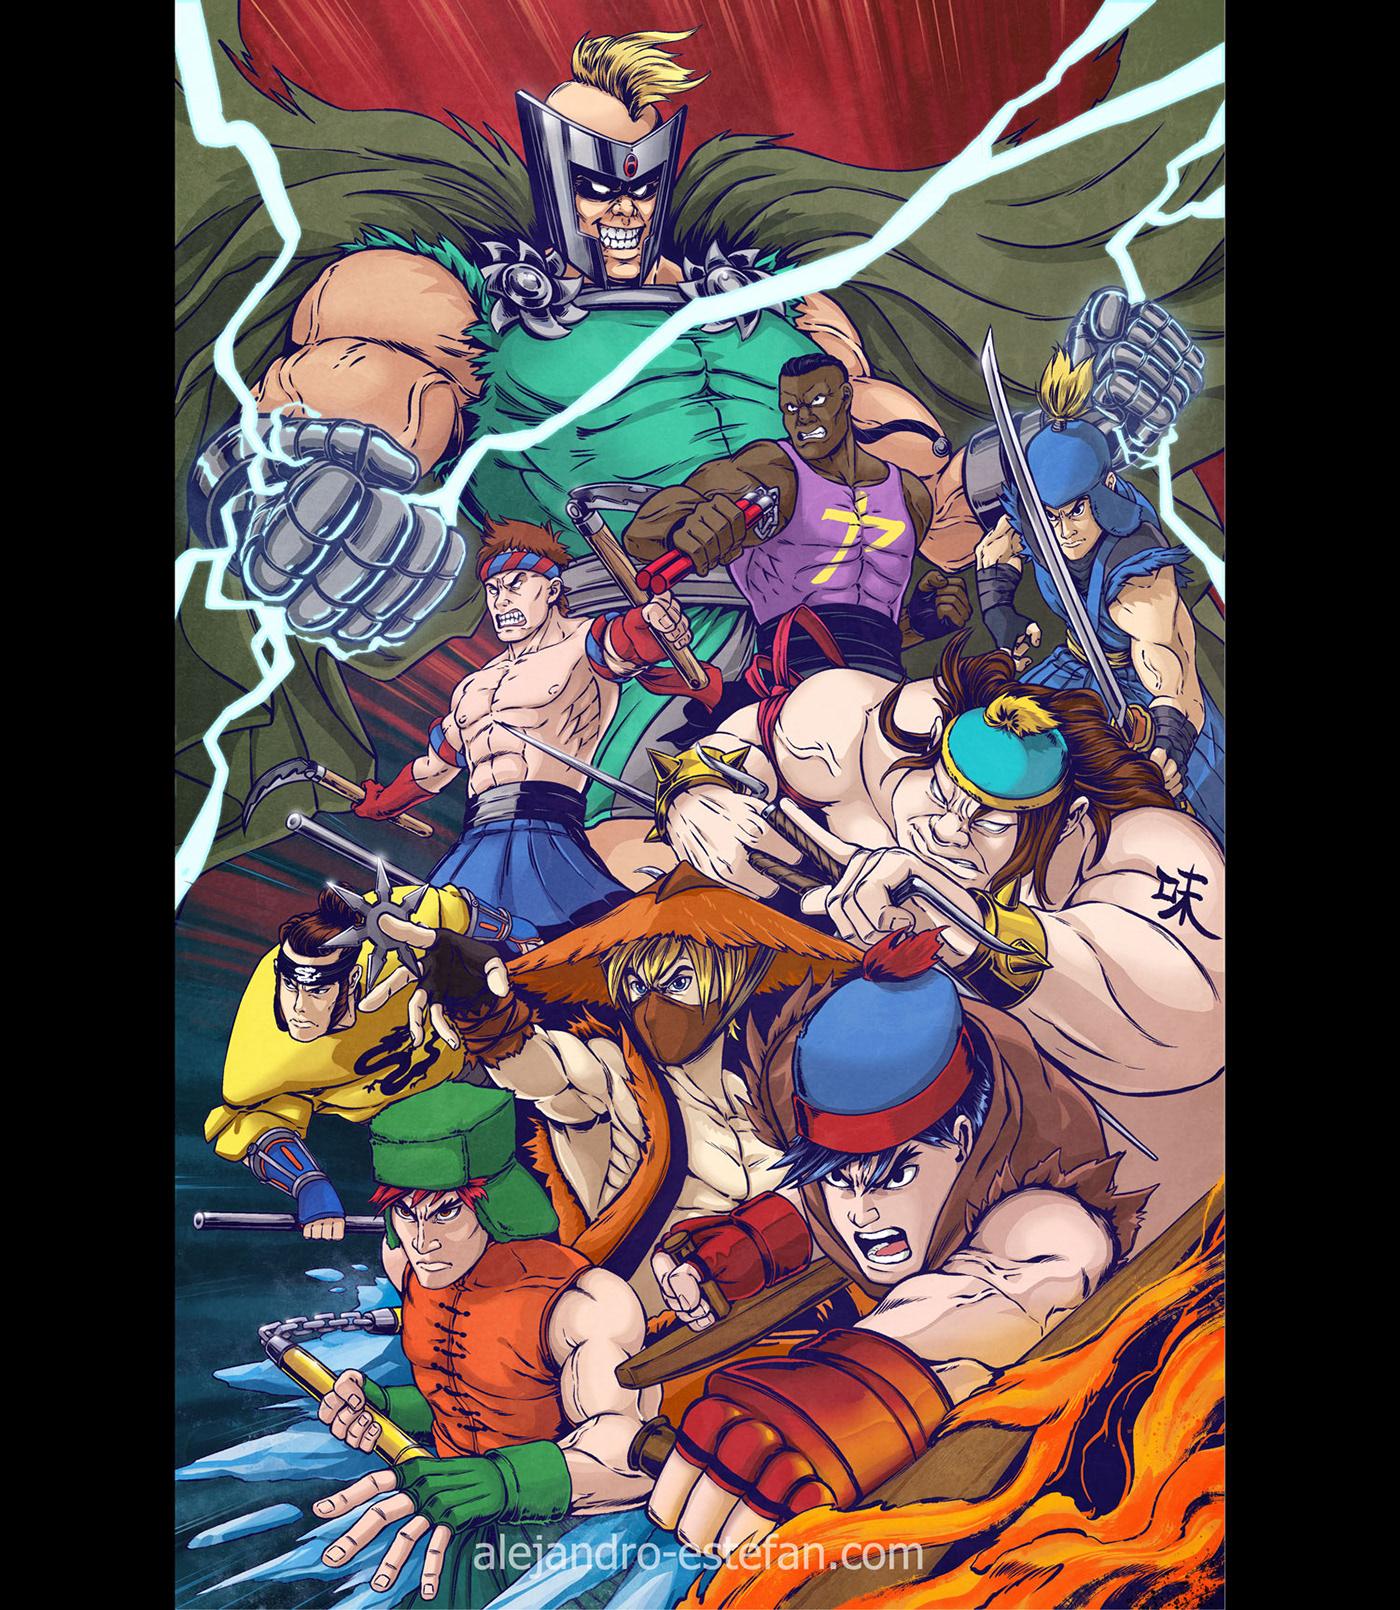 Image may contain: cartoon, comic and anime